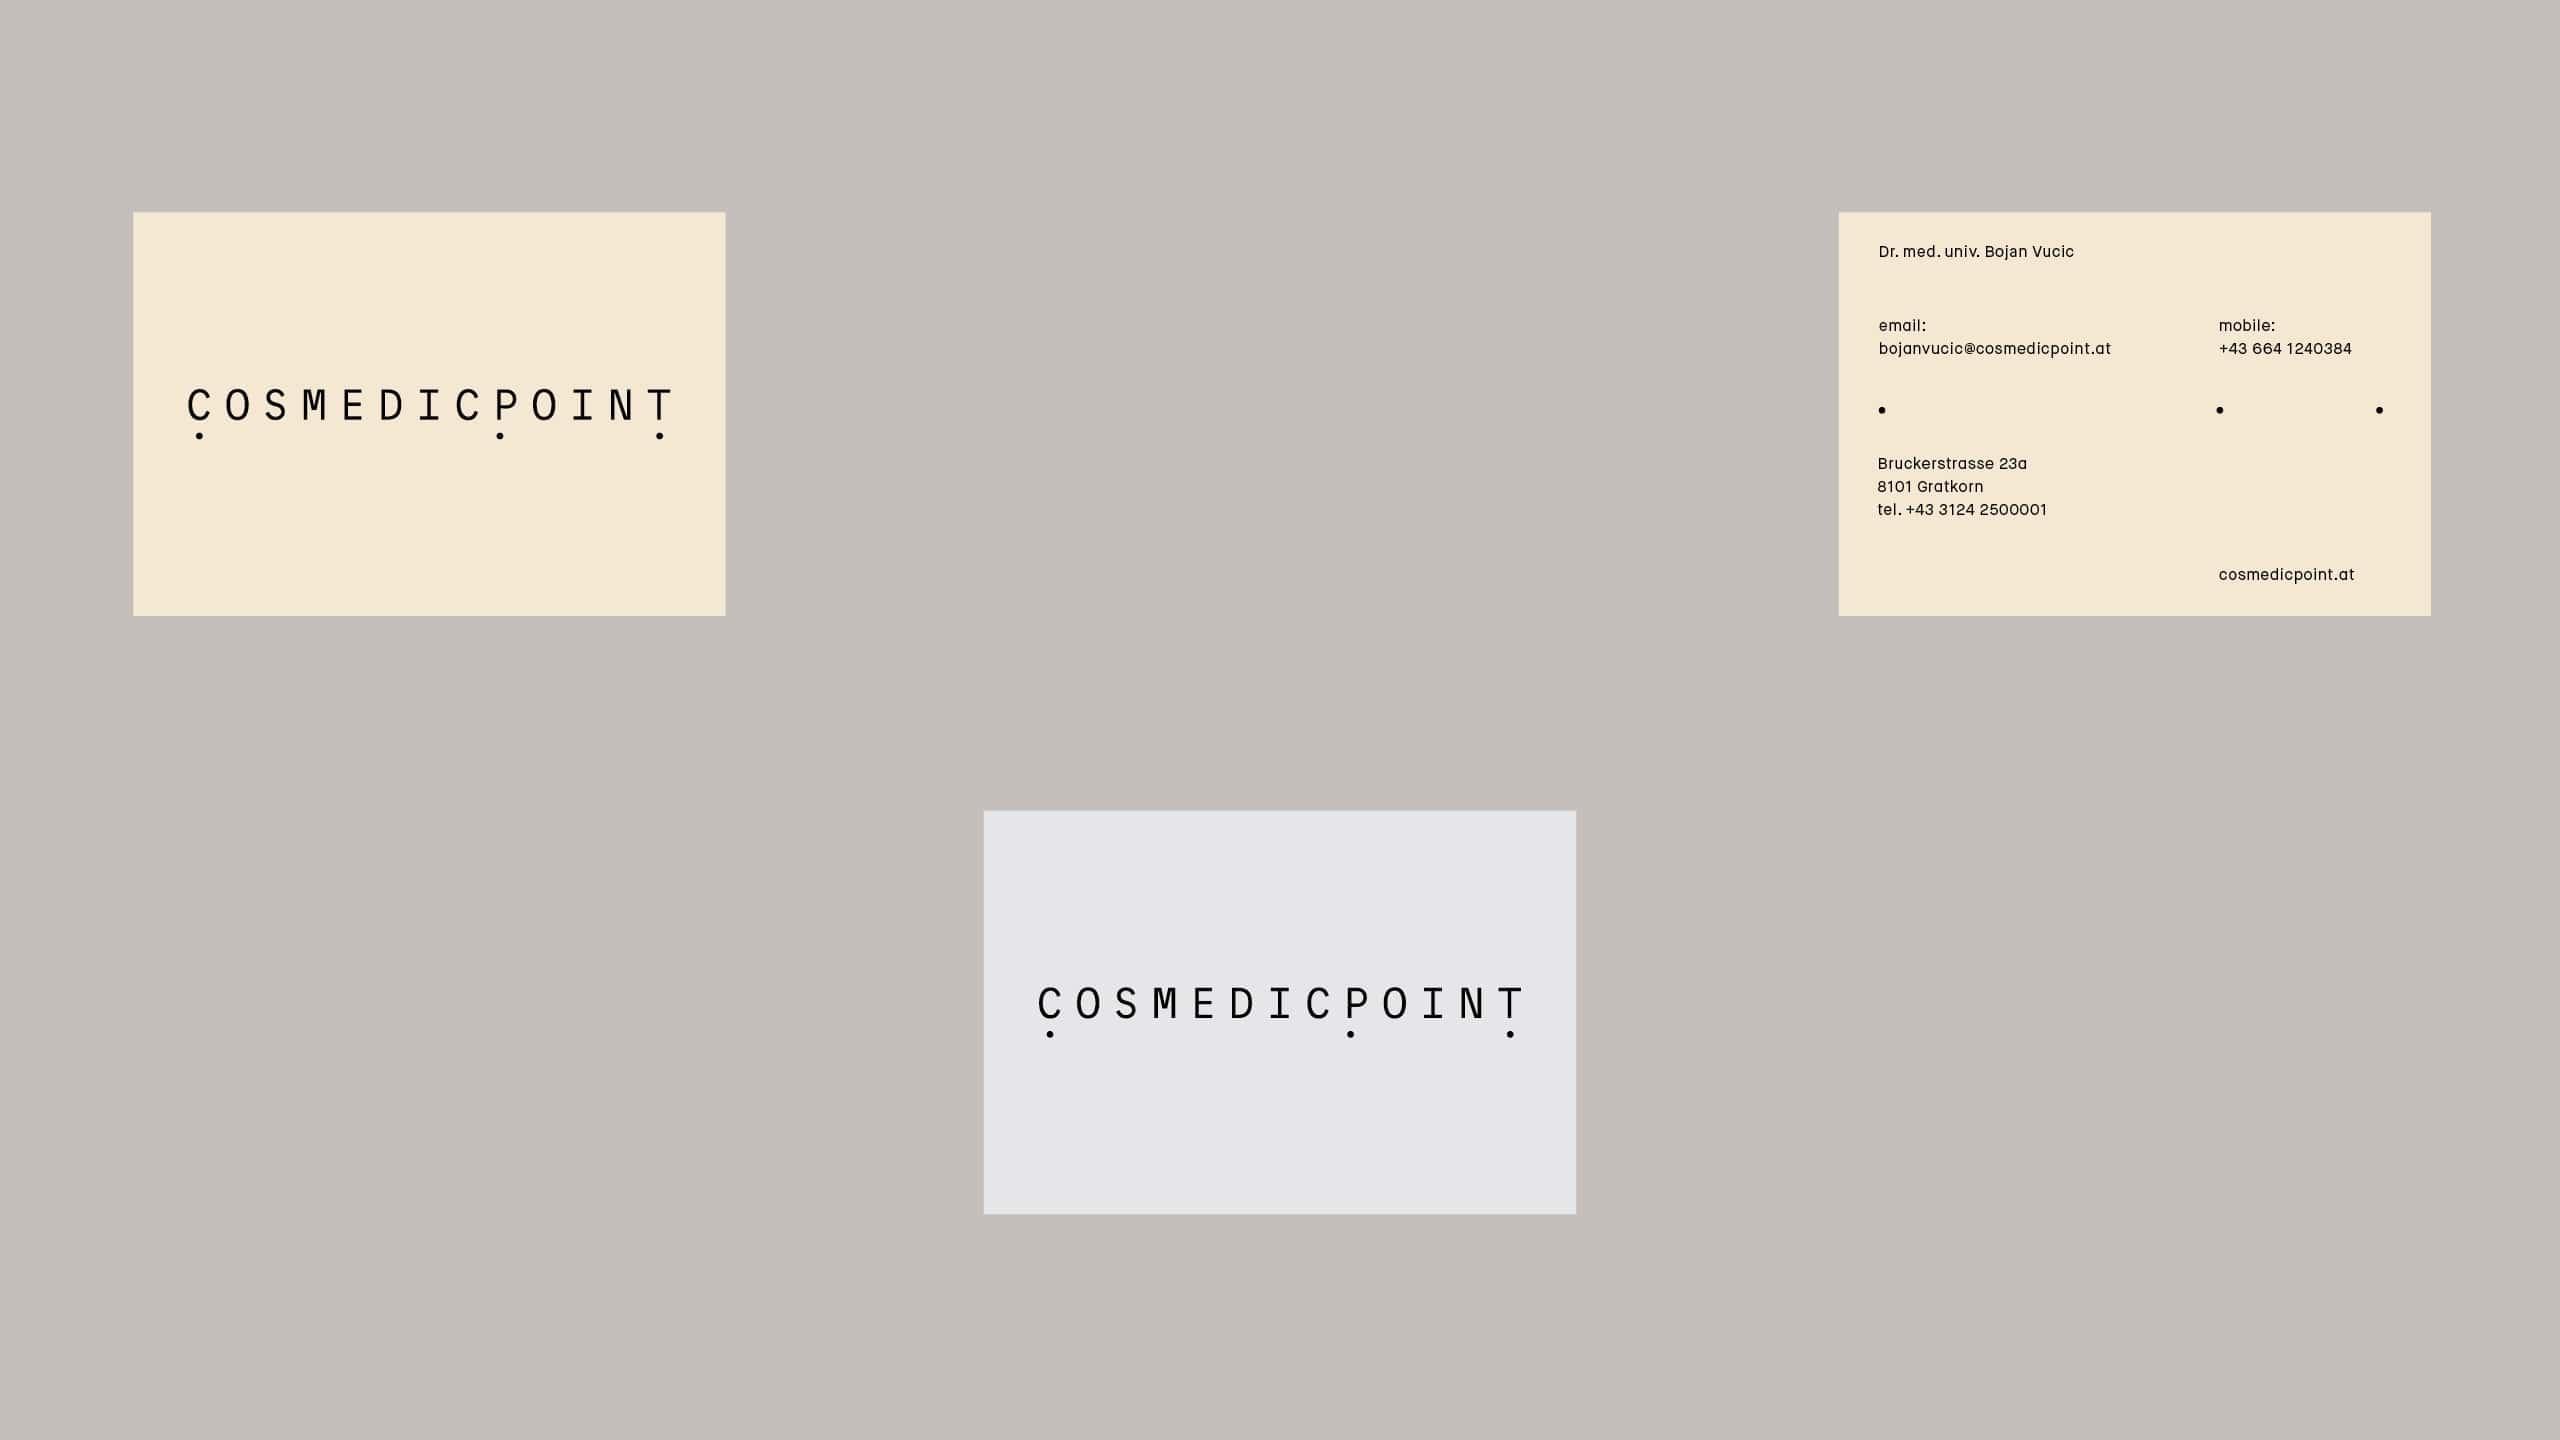 mantik-digital-branding-development-agency-chocolate-packaging-webdesign-design-39-min